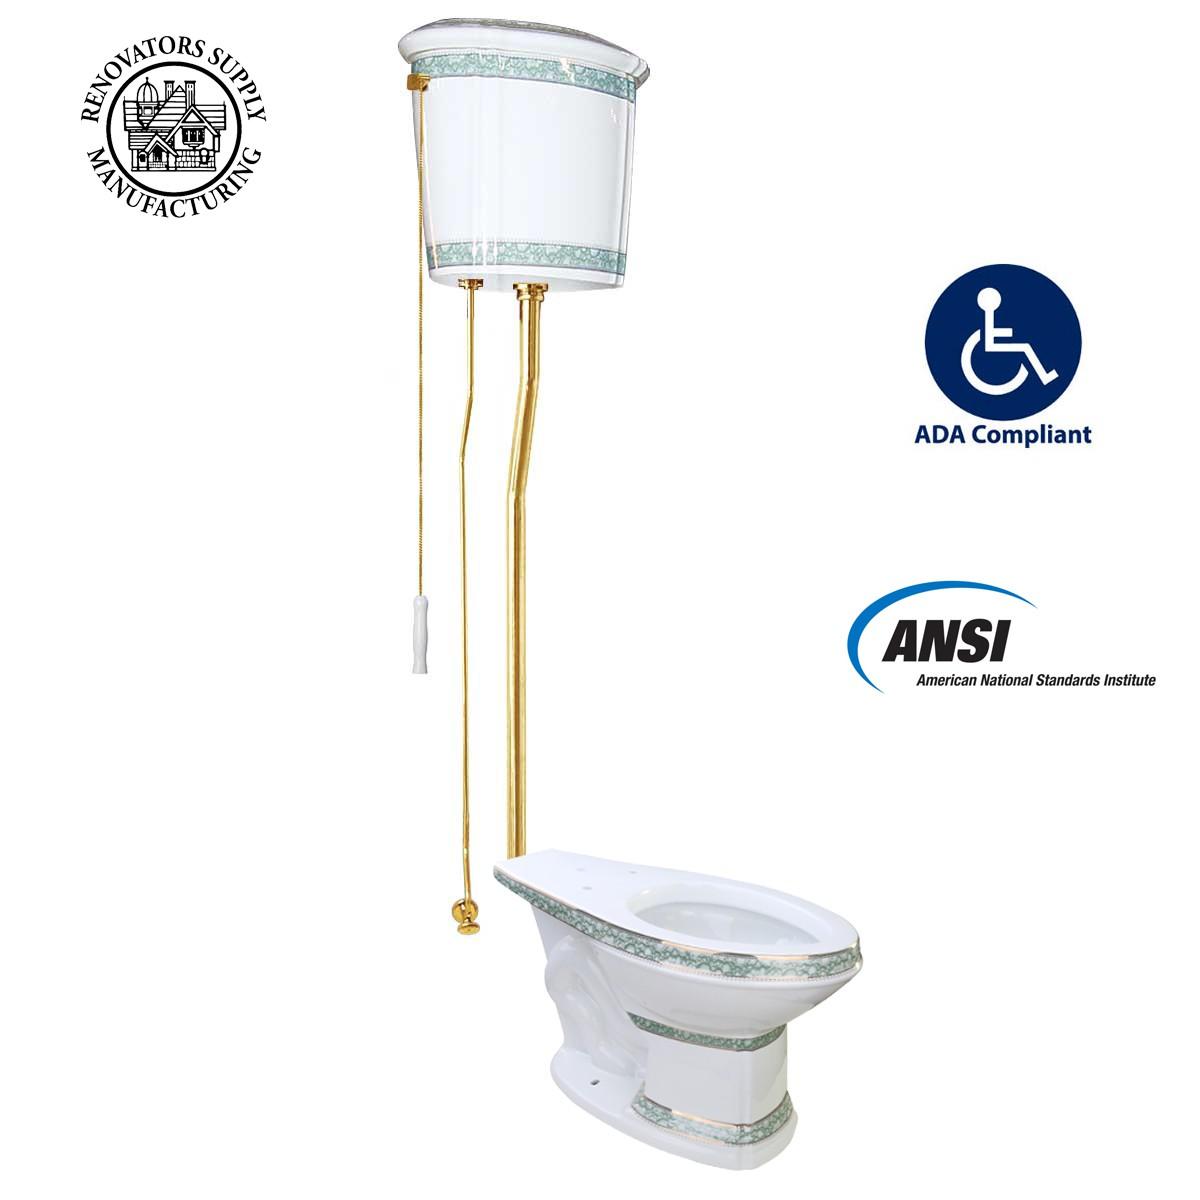 White China High Tank Toilet Green Trim Elongated Bowl